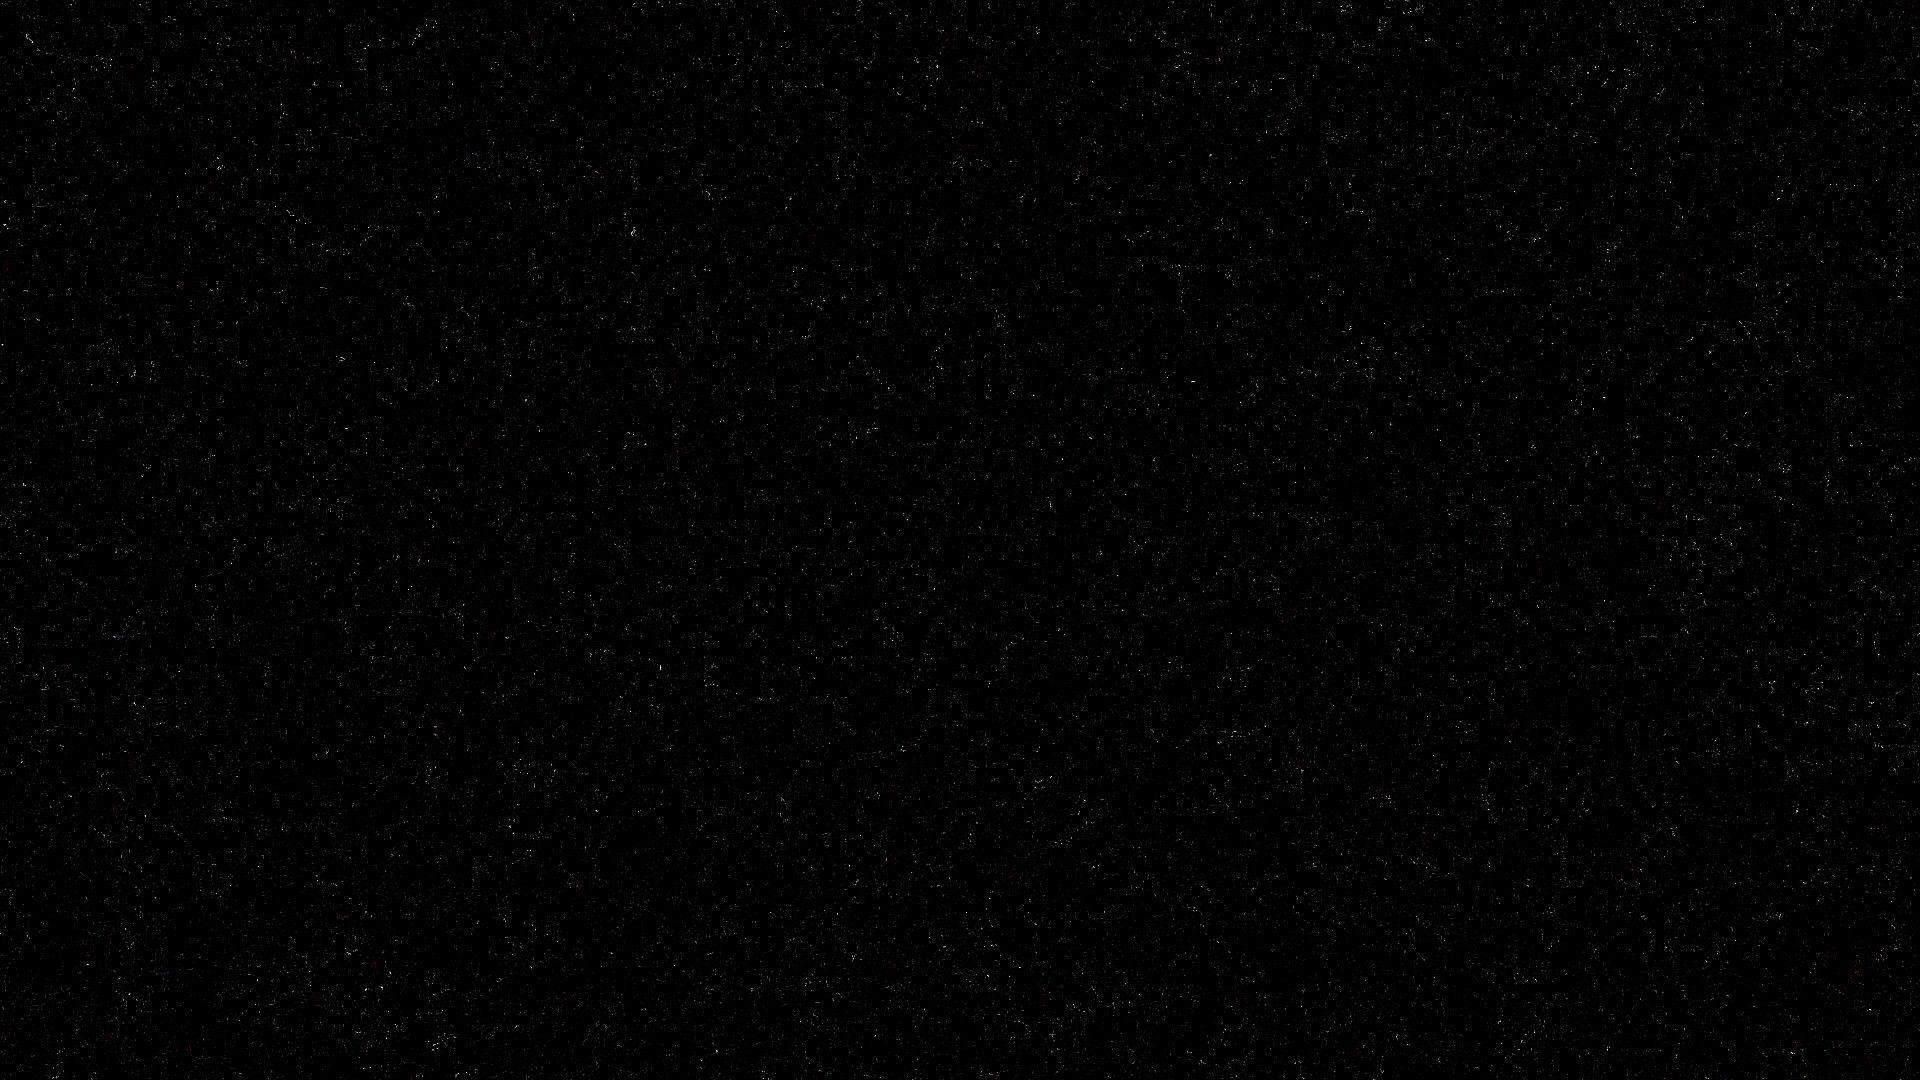 Black Screen Wallpapers On Wallpaperdog